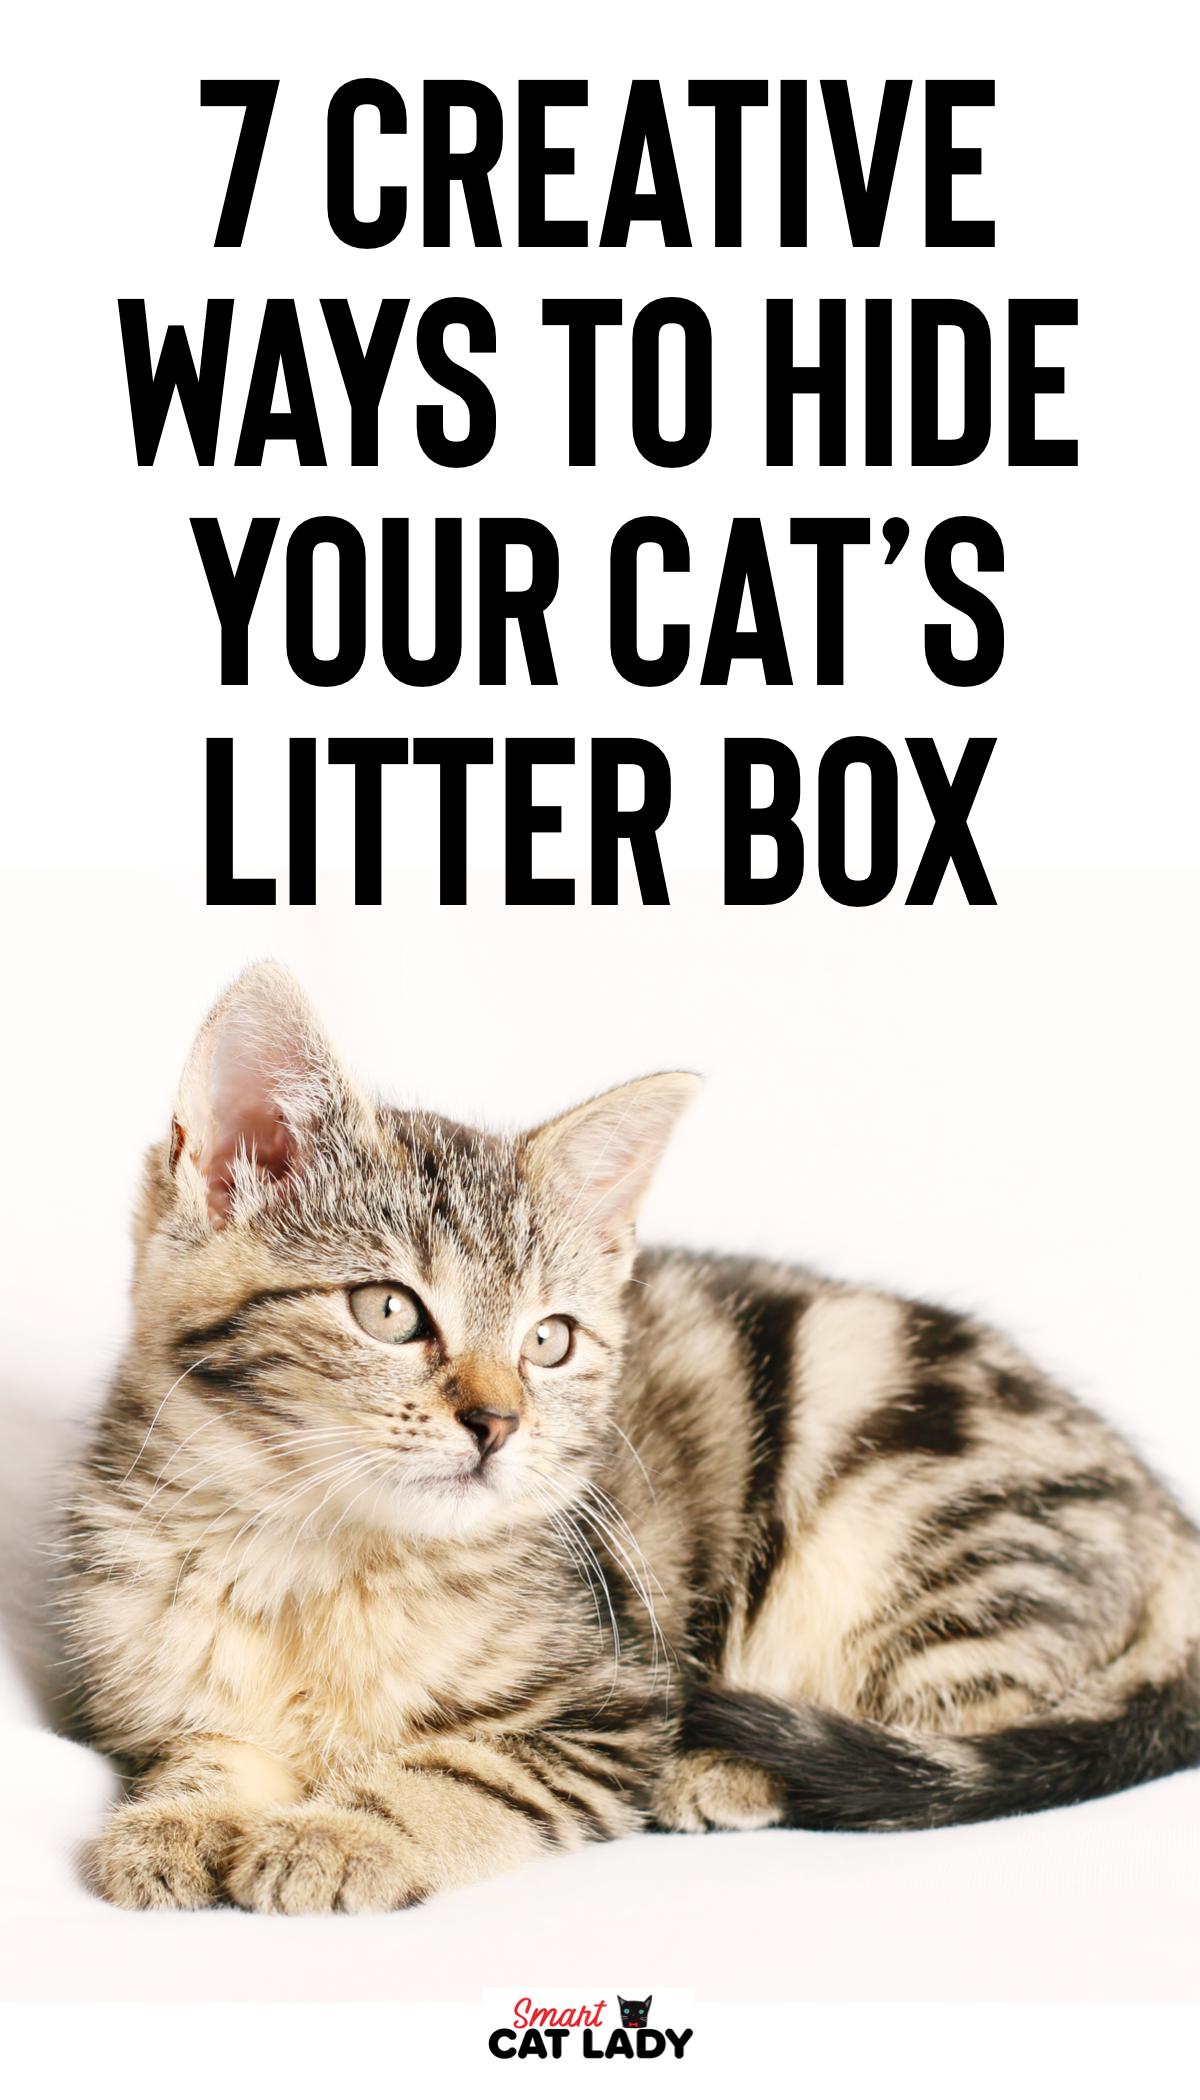 7 Creative Ways To Hide Your Cats Litter Box Cat litter